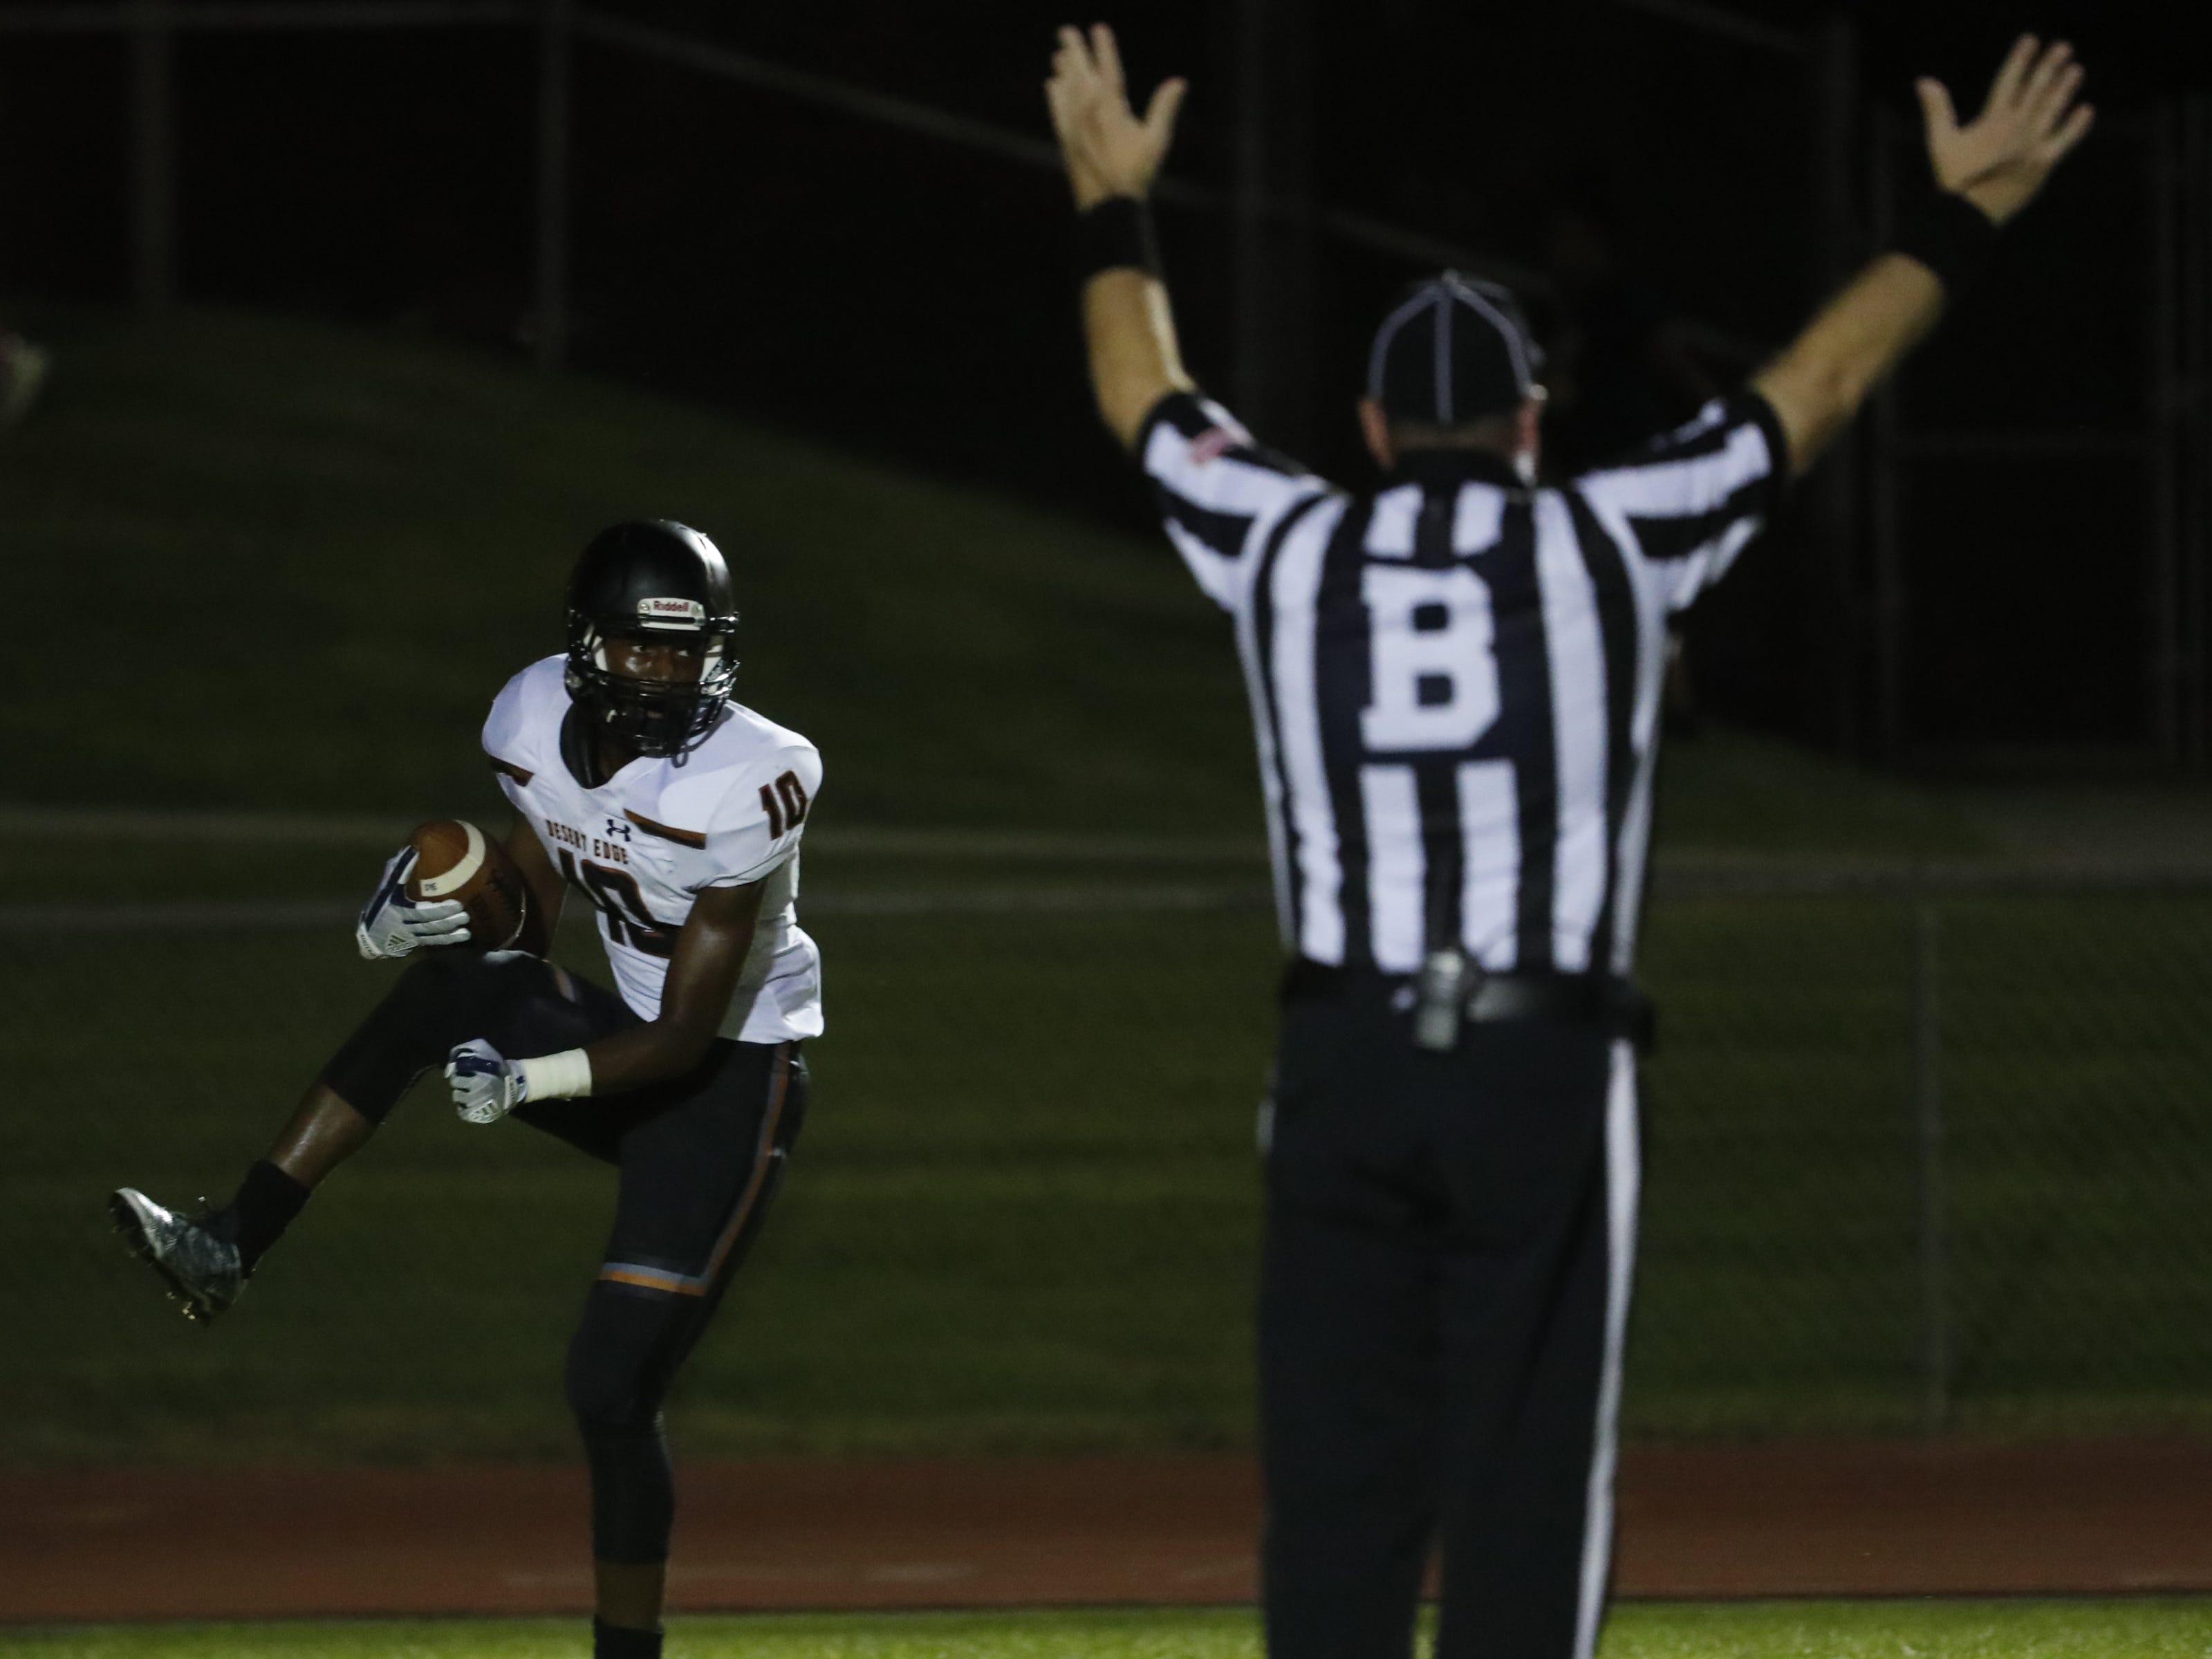 Desert Edge's Jihad Marks (10) celebrates a touchdown against Millennium during a game at Millennium High School in Goodyear, Ariz. on Sept. 7, 2018.